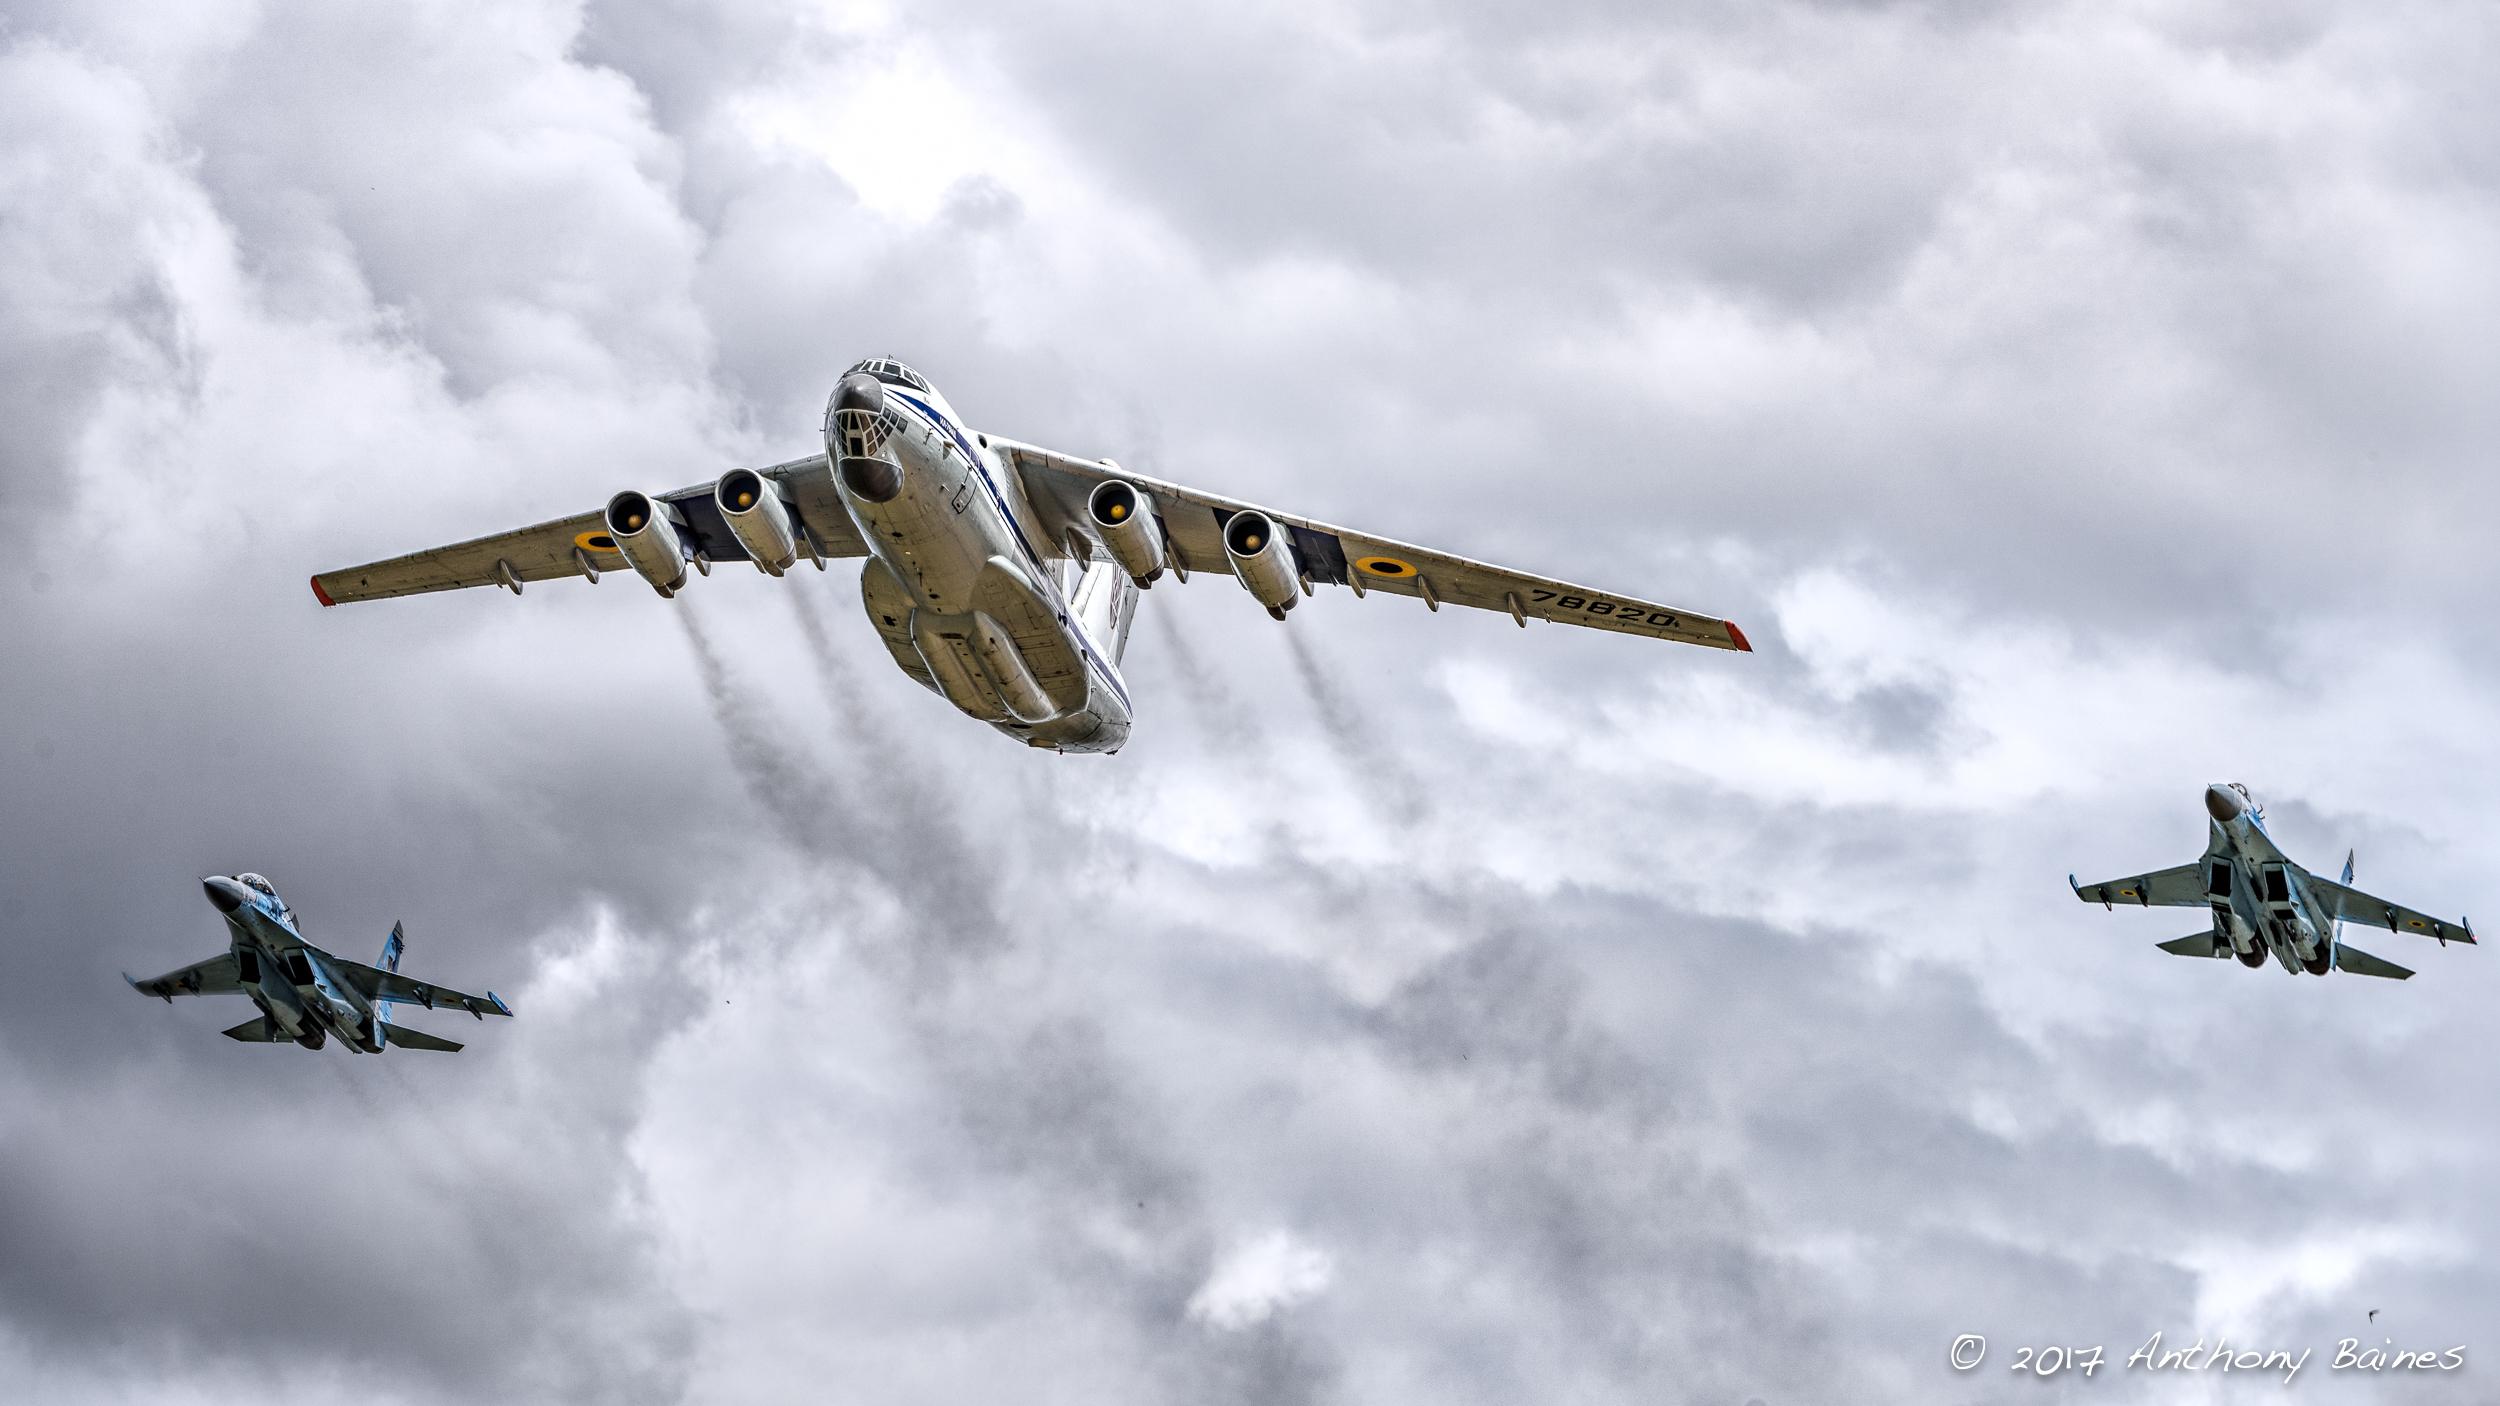 Two Ukrainan Su-27 and an IL-76